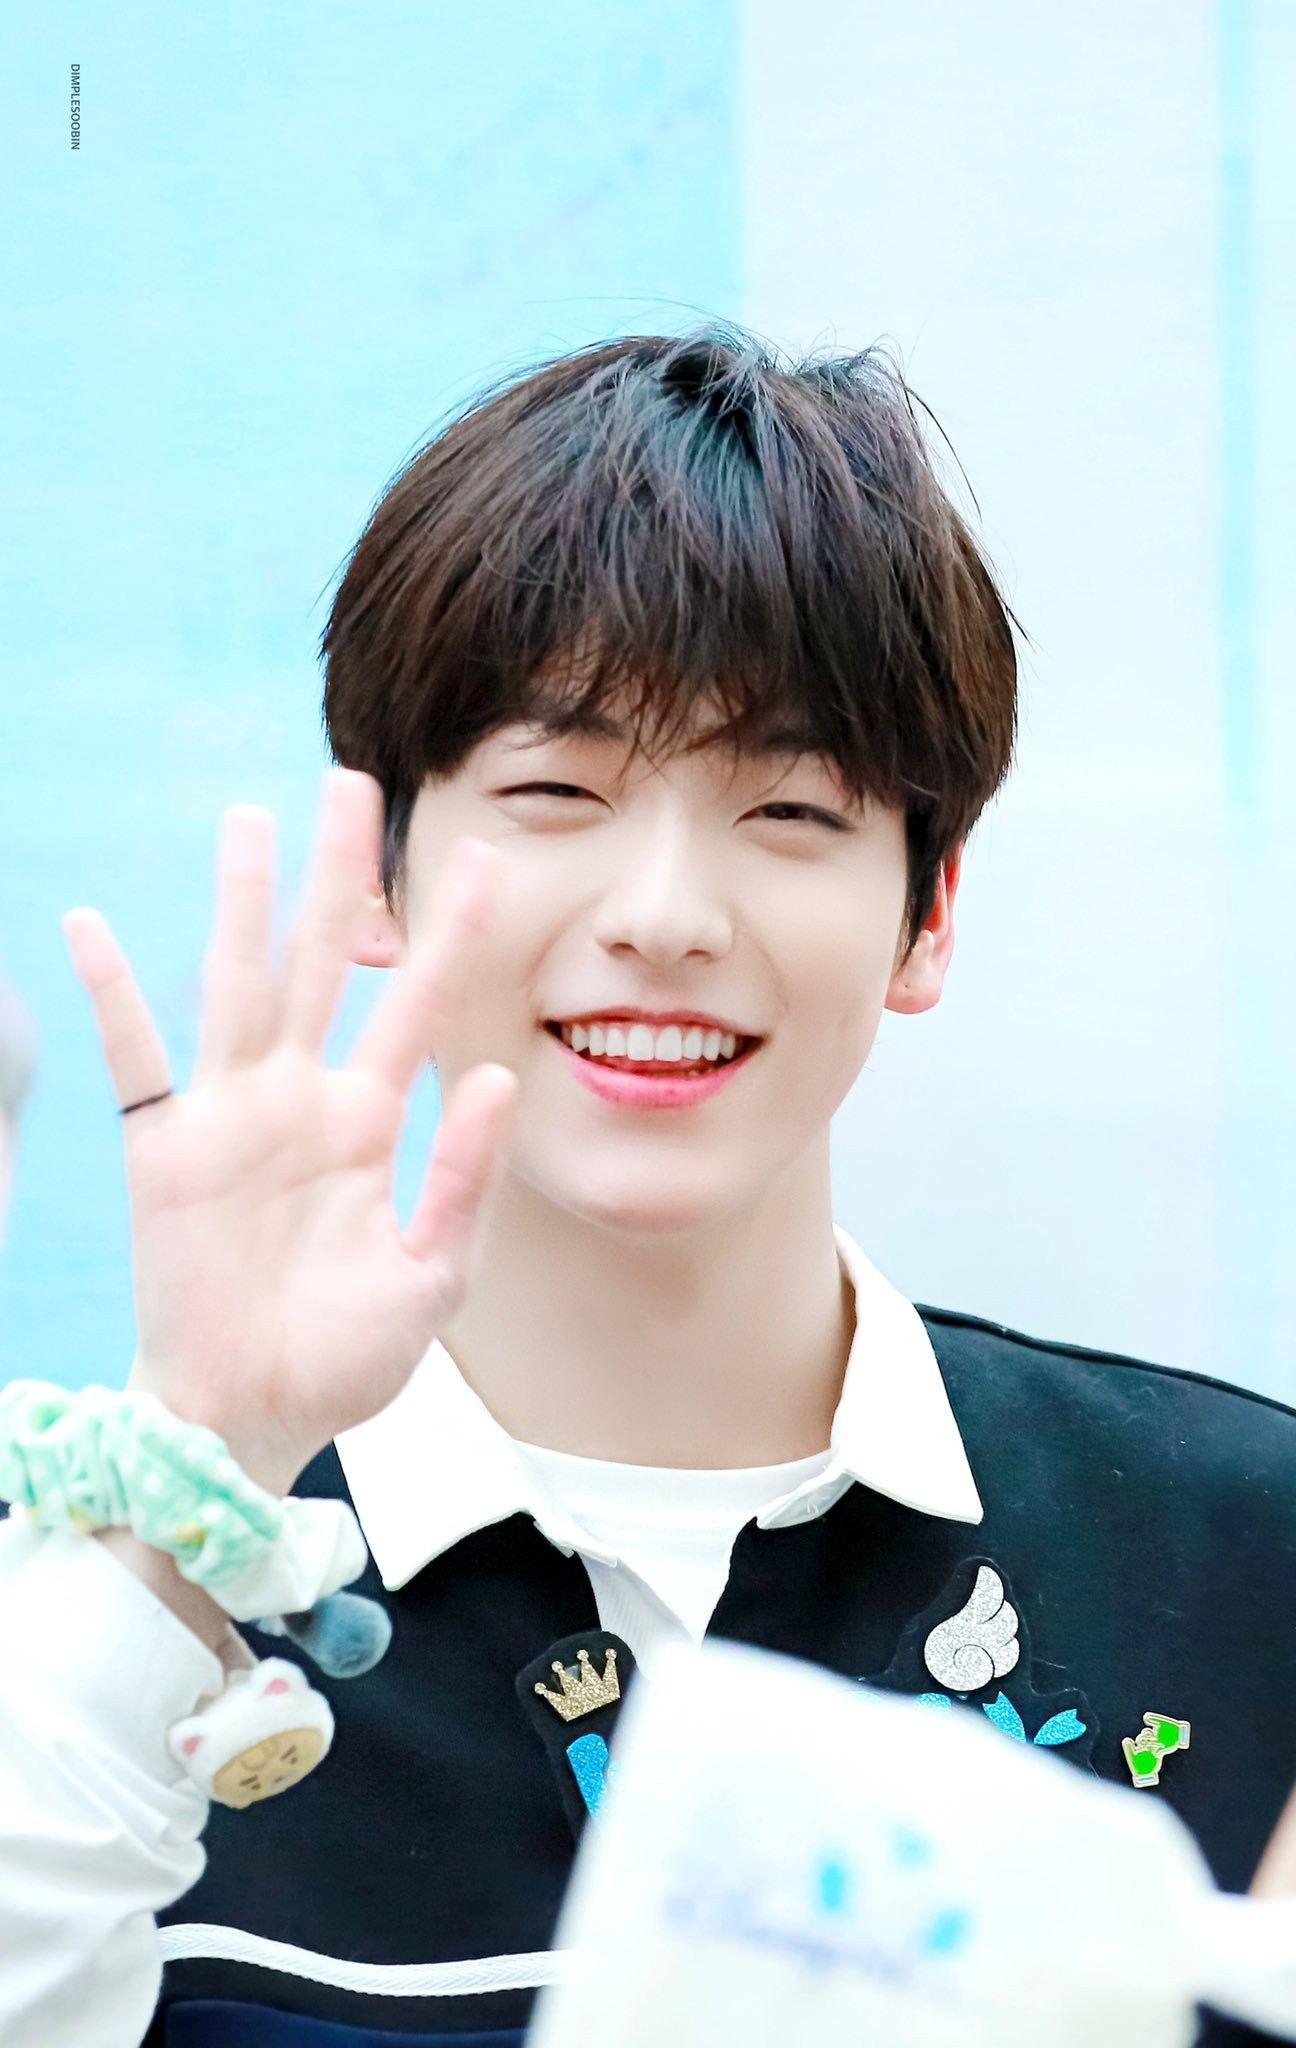 soobin with a sweet smile   Txt, Boy groups, South korean boy band